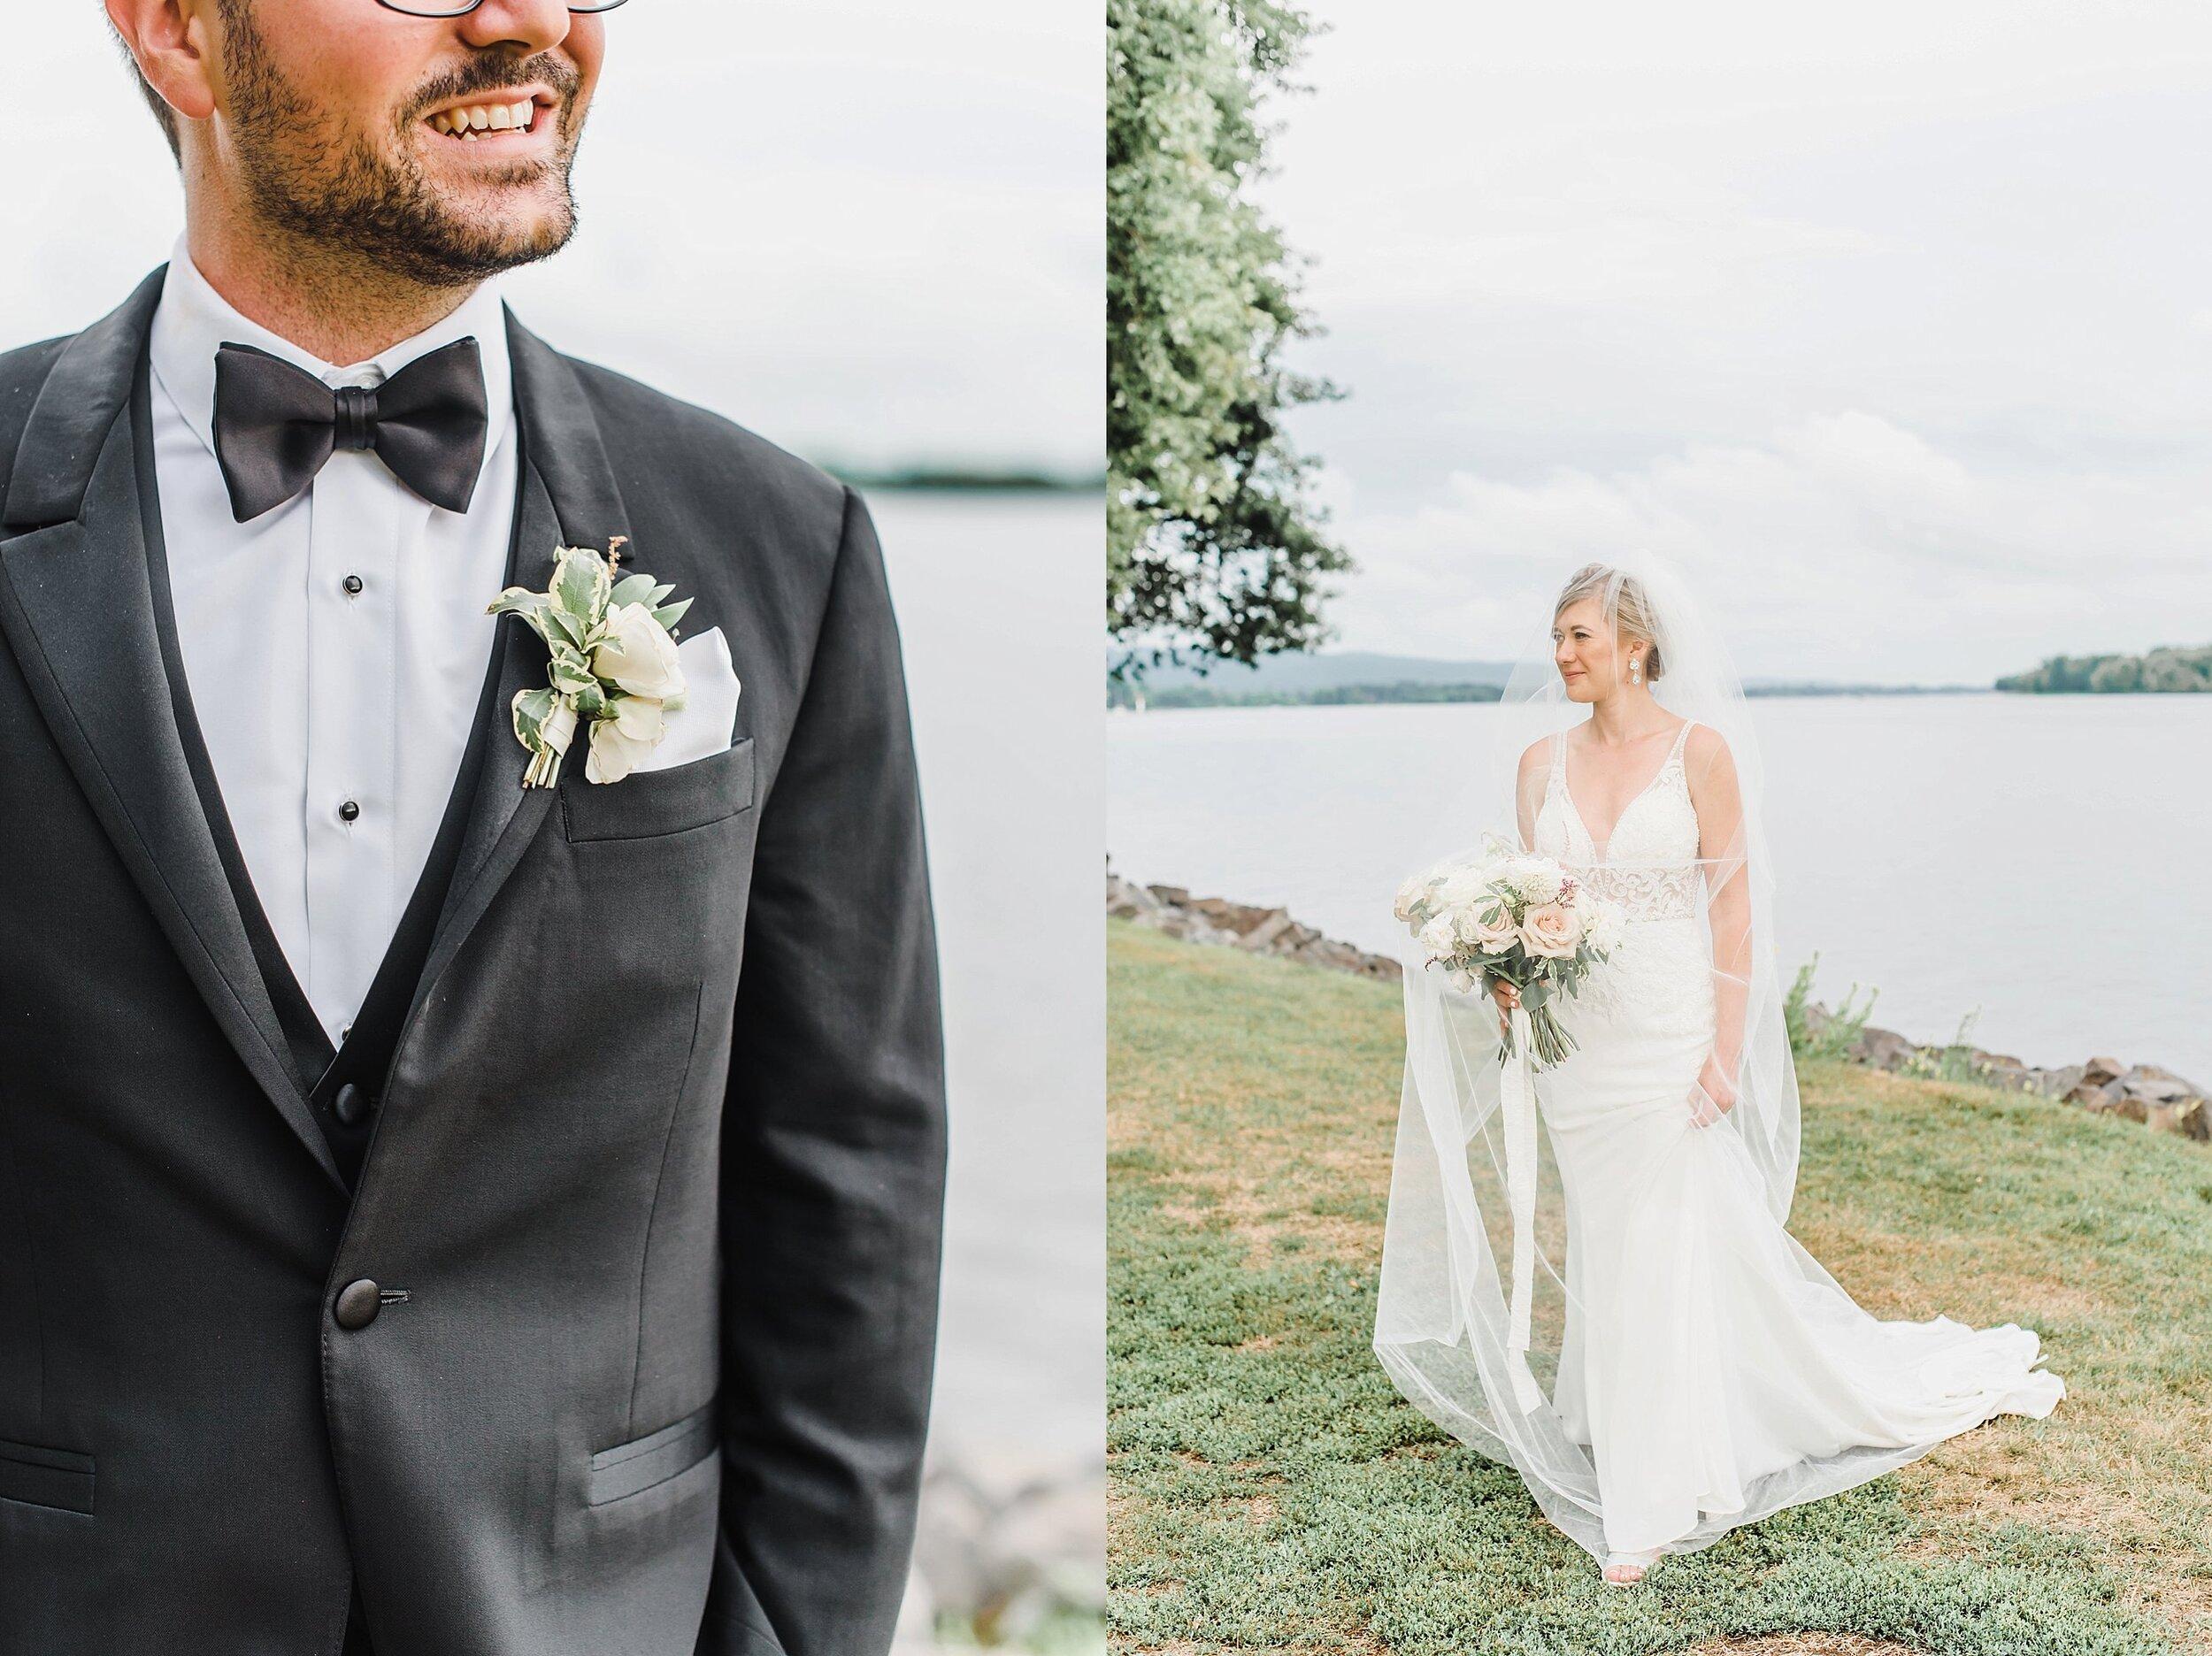 light airy fine art ottawa wedding photographer | Ali and Batoul Photography | Fairmont Le Chateau Montebello56.jpg